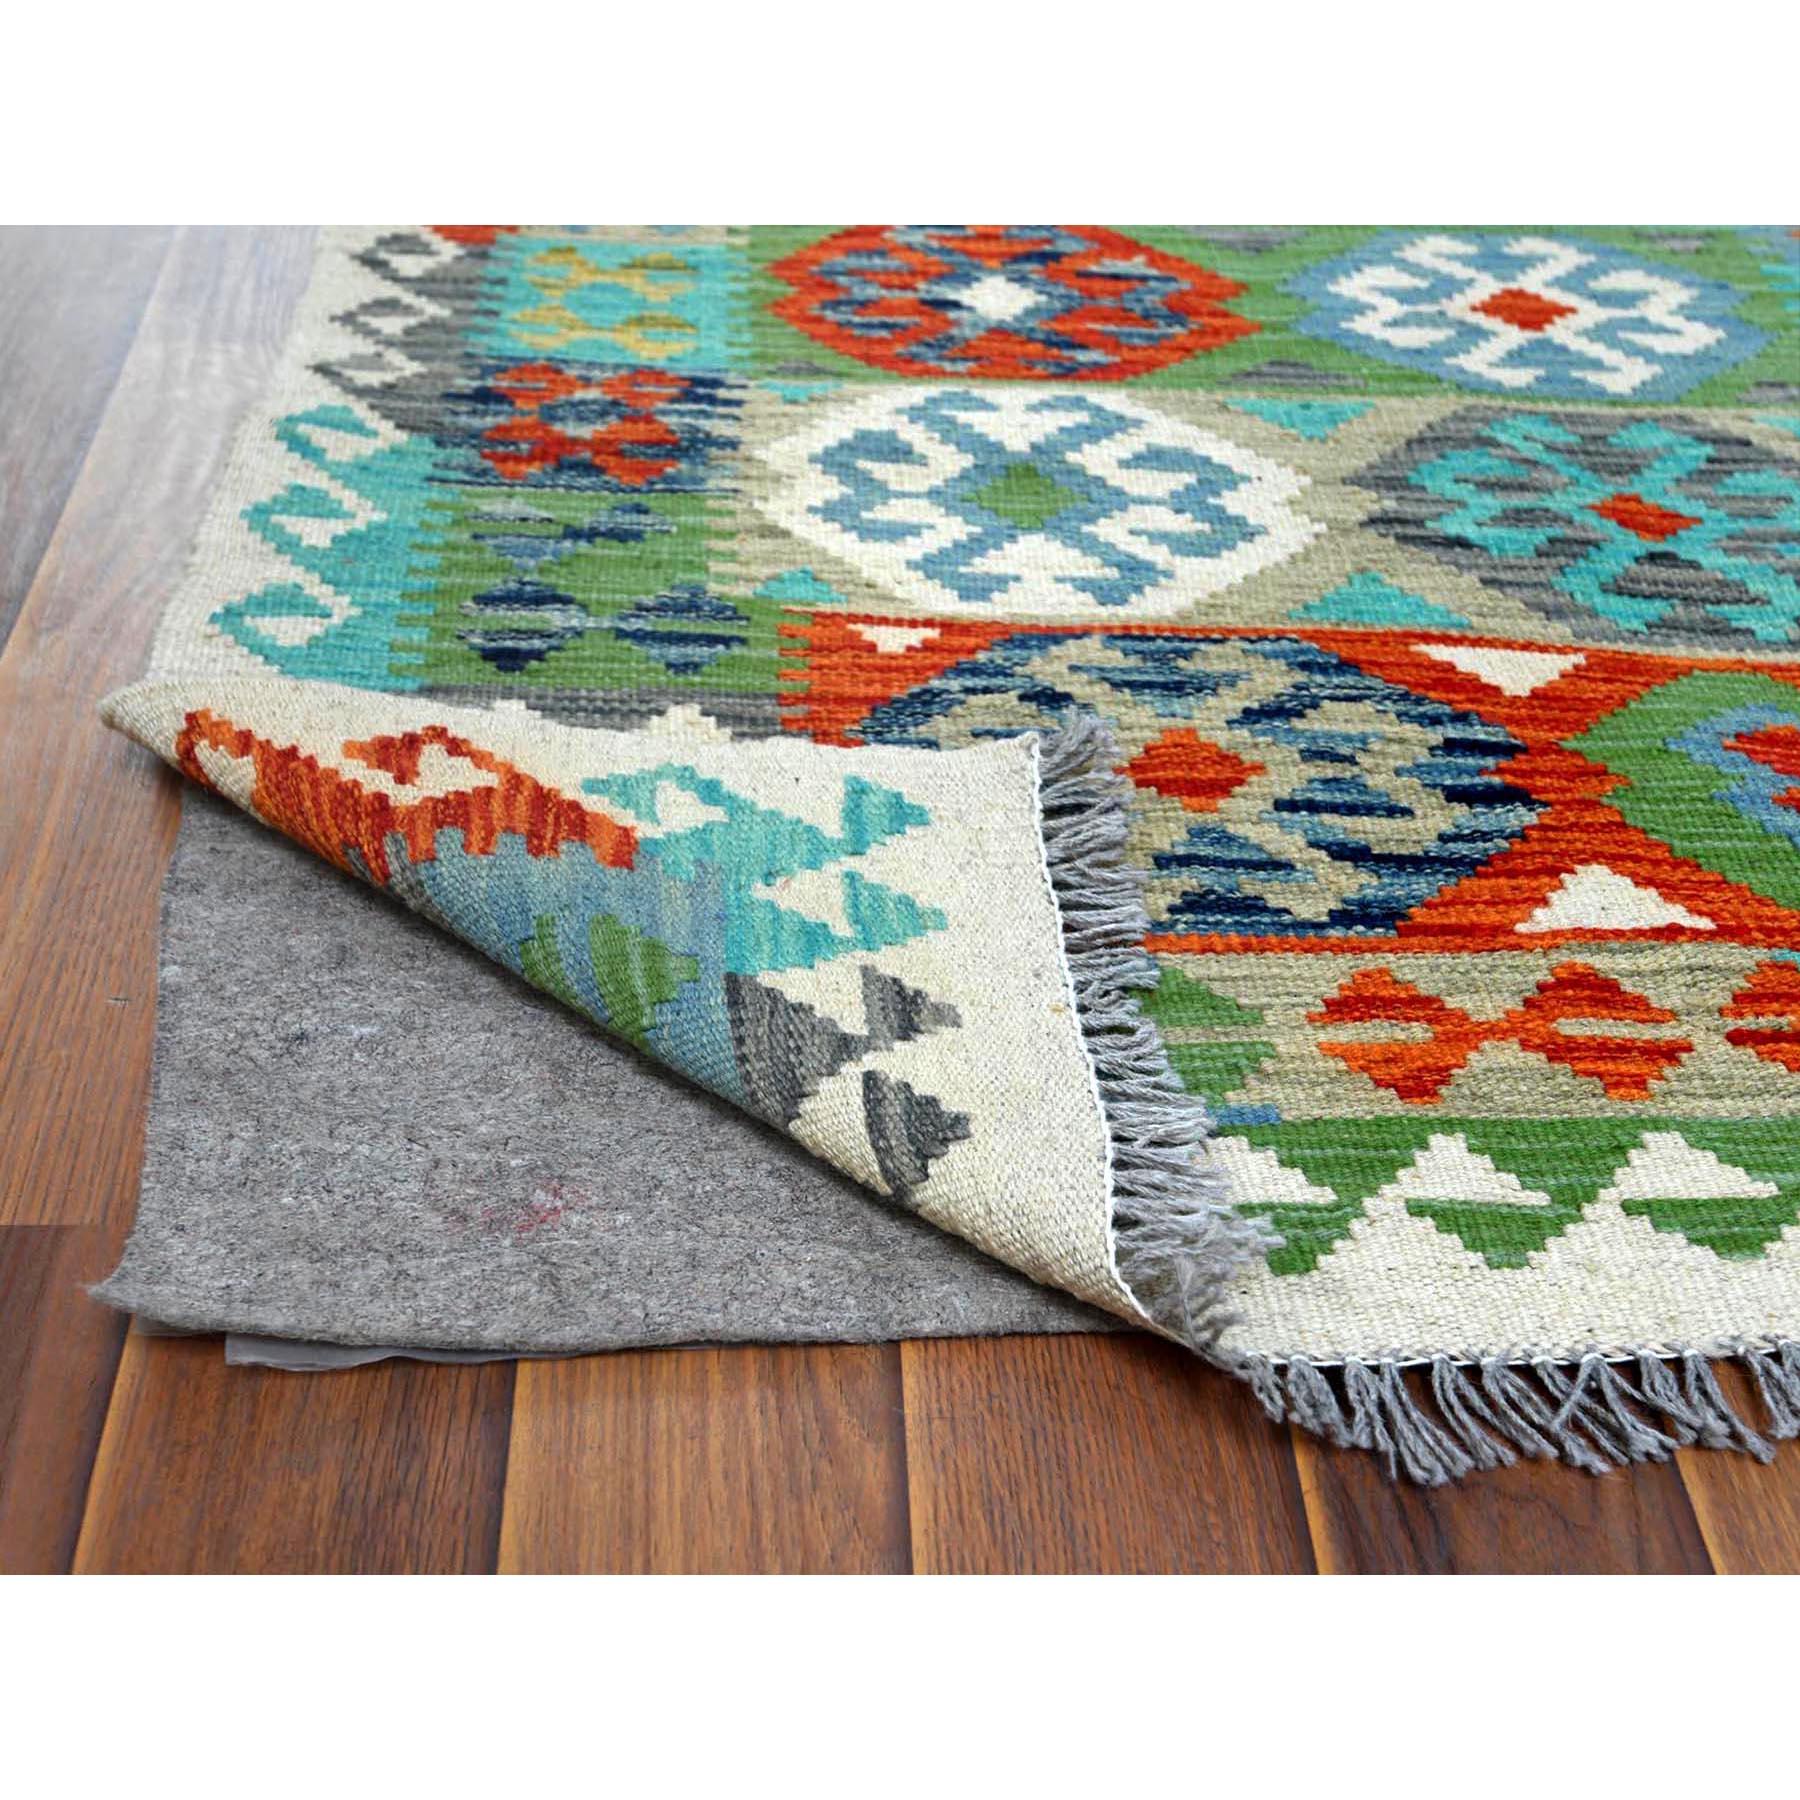 "2'8""x12'8"" Green Afghan Kilim Tribal And Geometric Design Glimmery Wool Hand Woven Oriental Runner Reversible Rug"